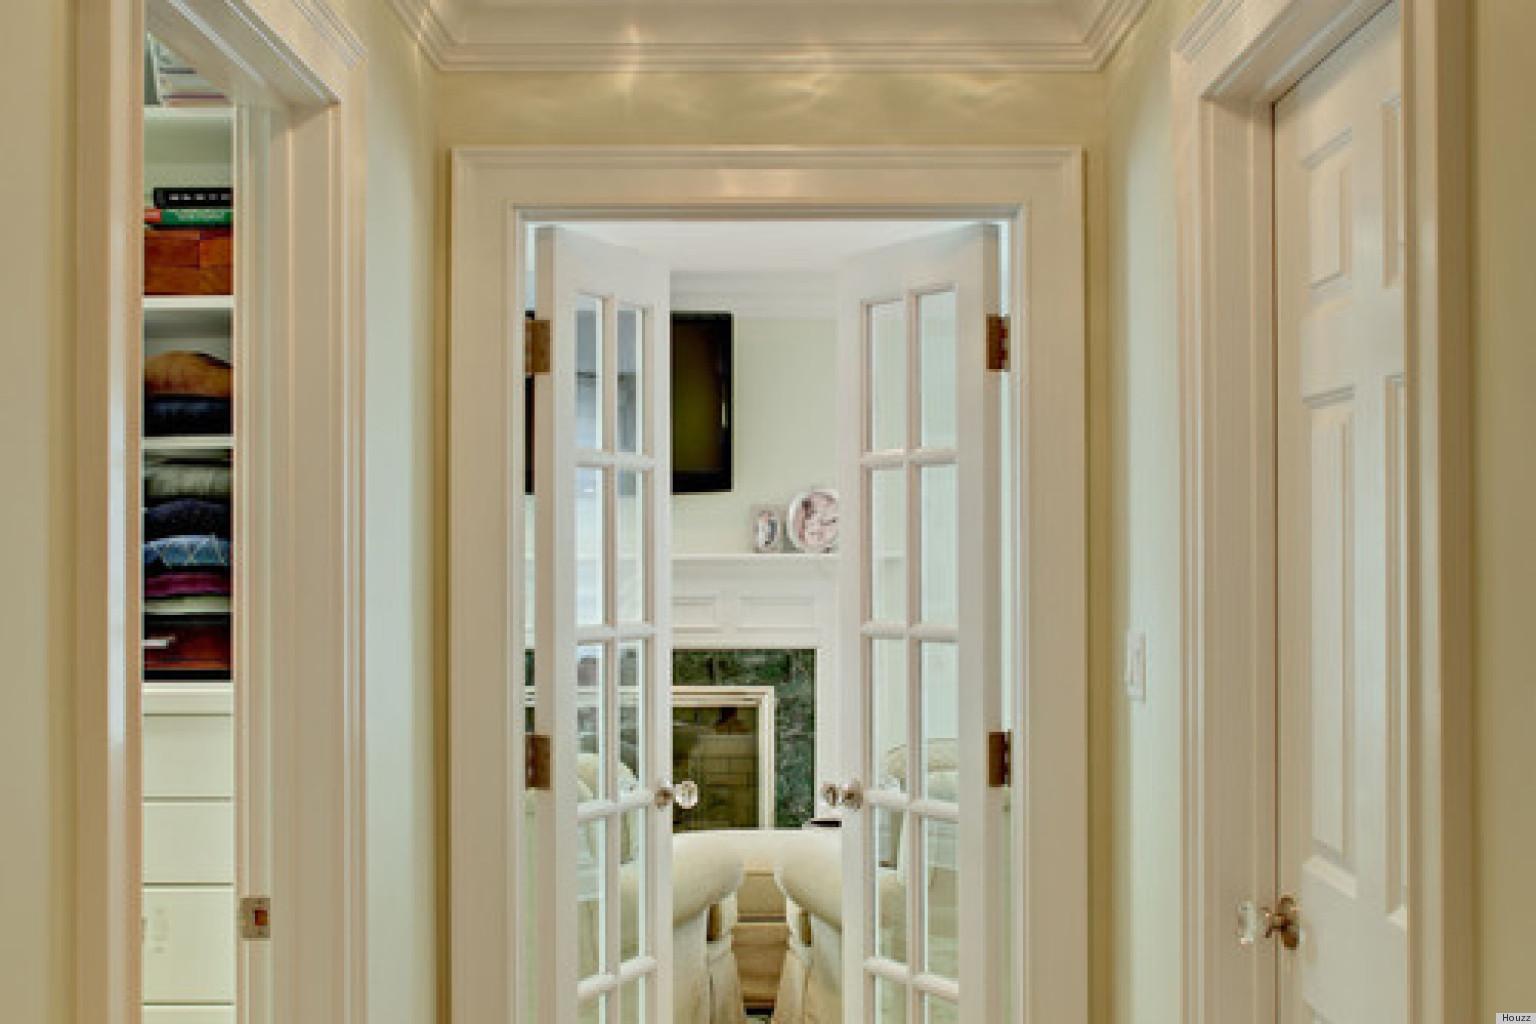 french doors interior design ideas photo - 10